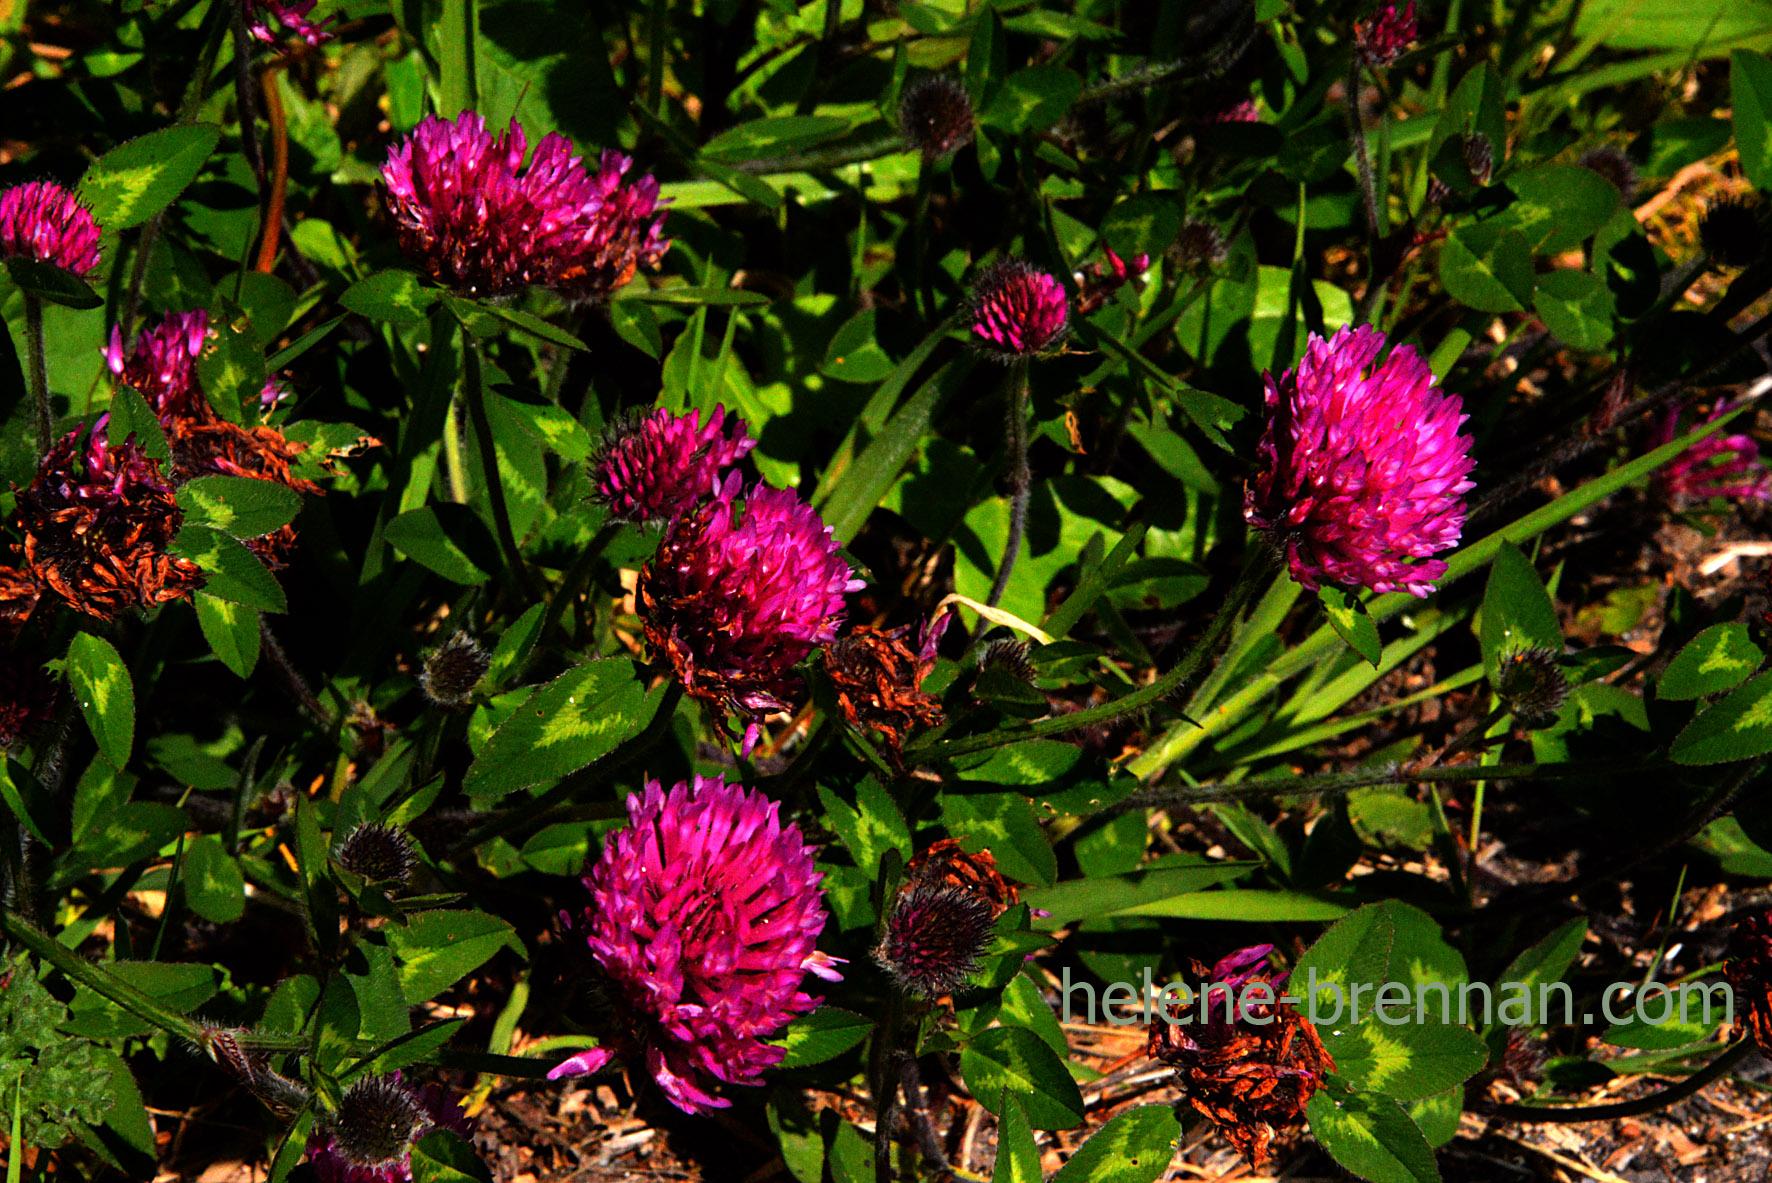 DSC_3268 red clover